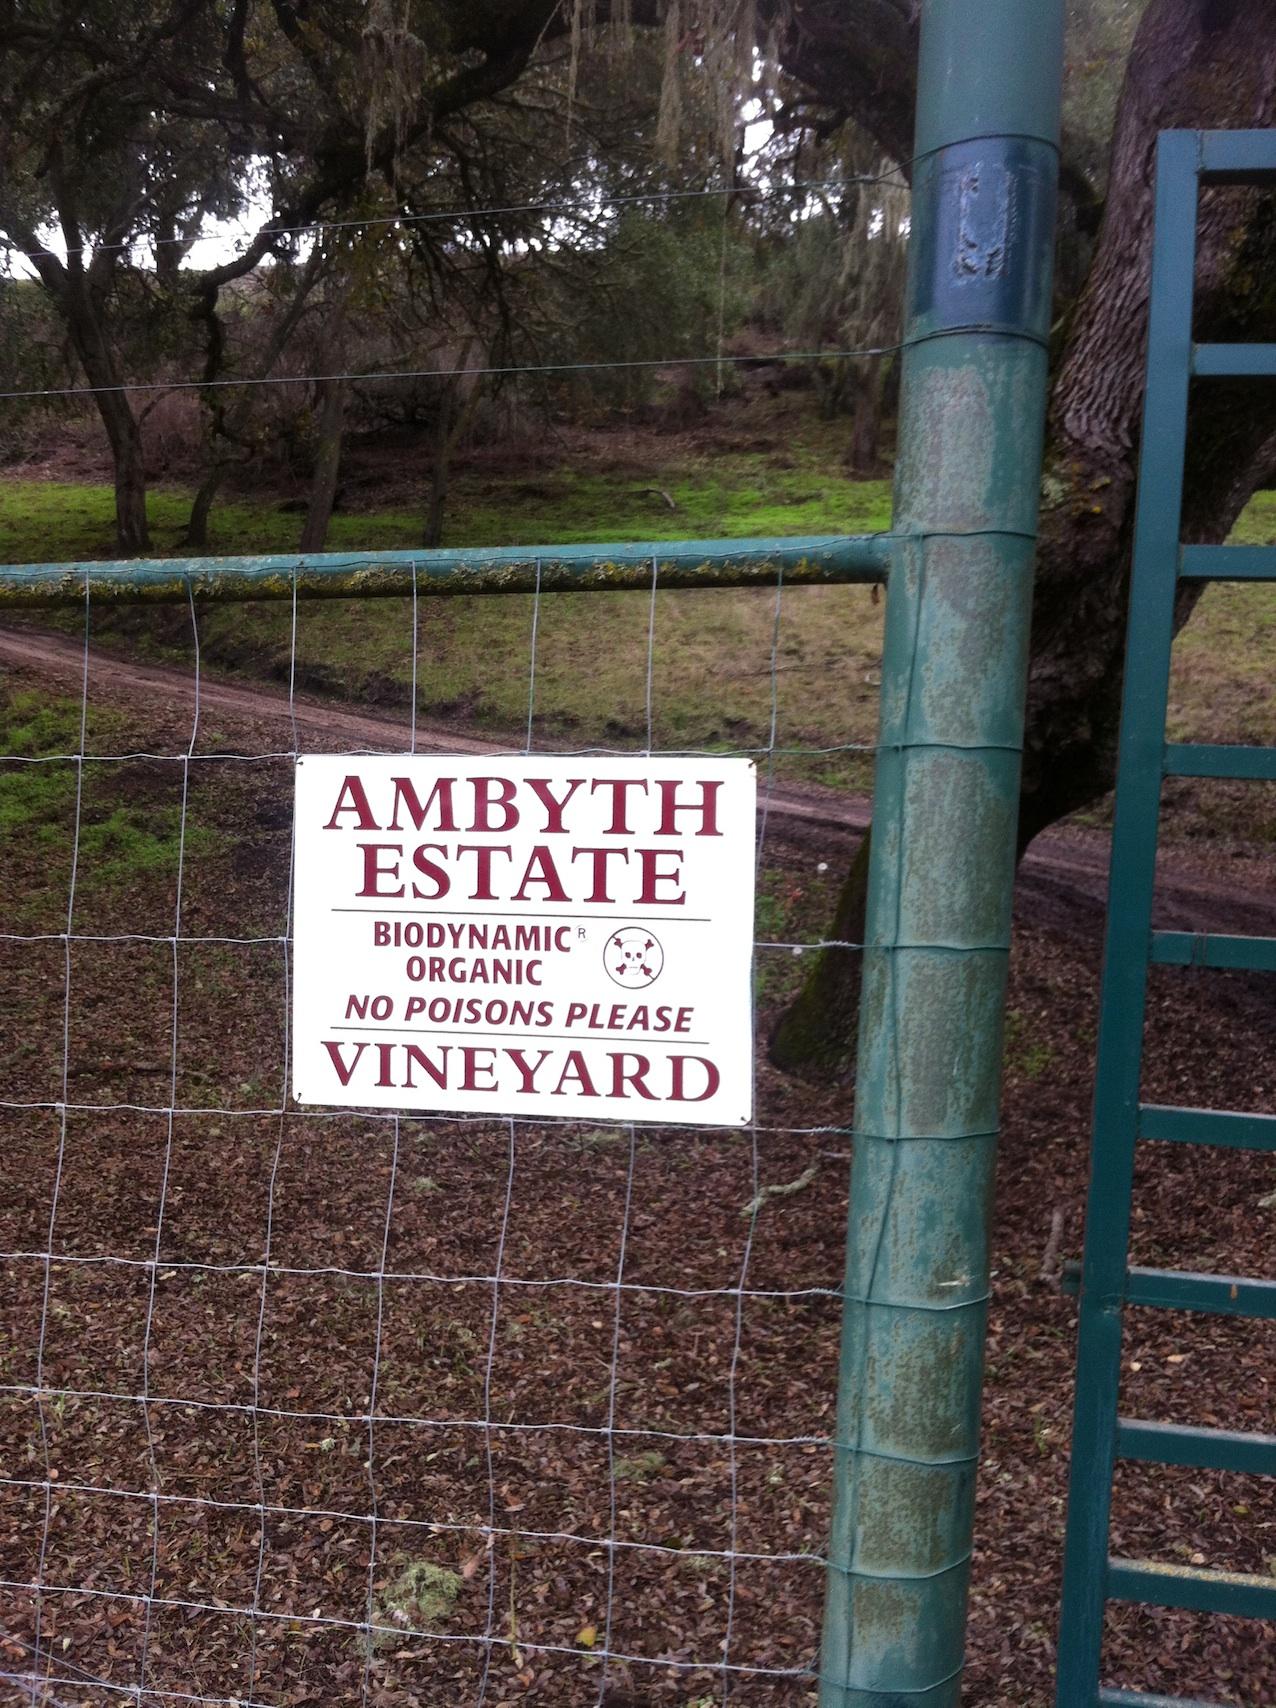 Ambyth Estate- No Poisons Please